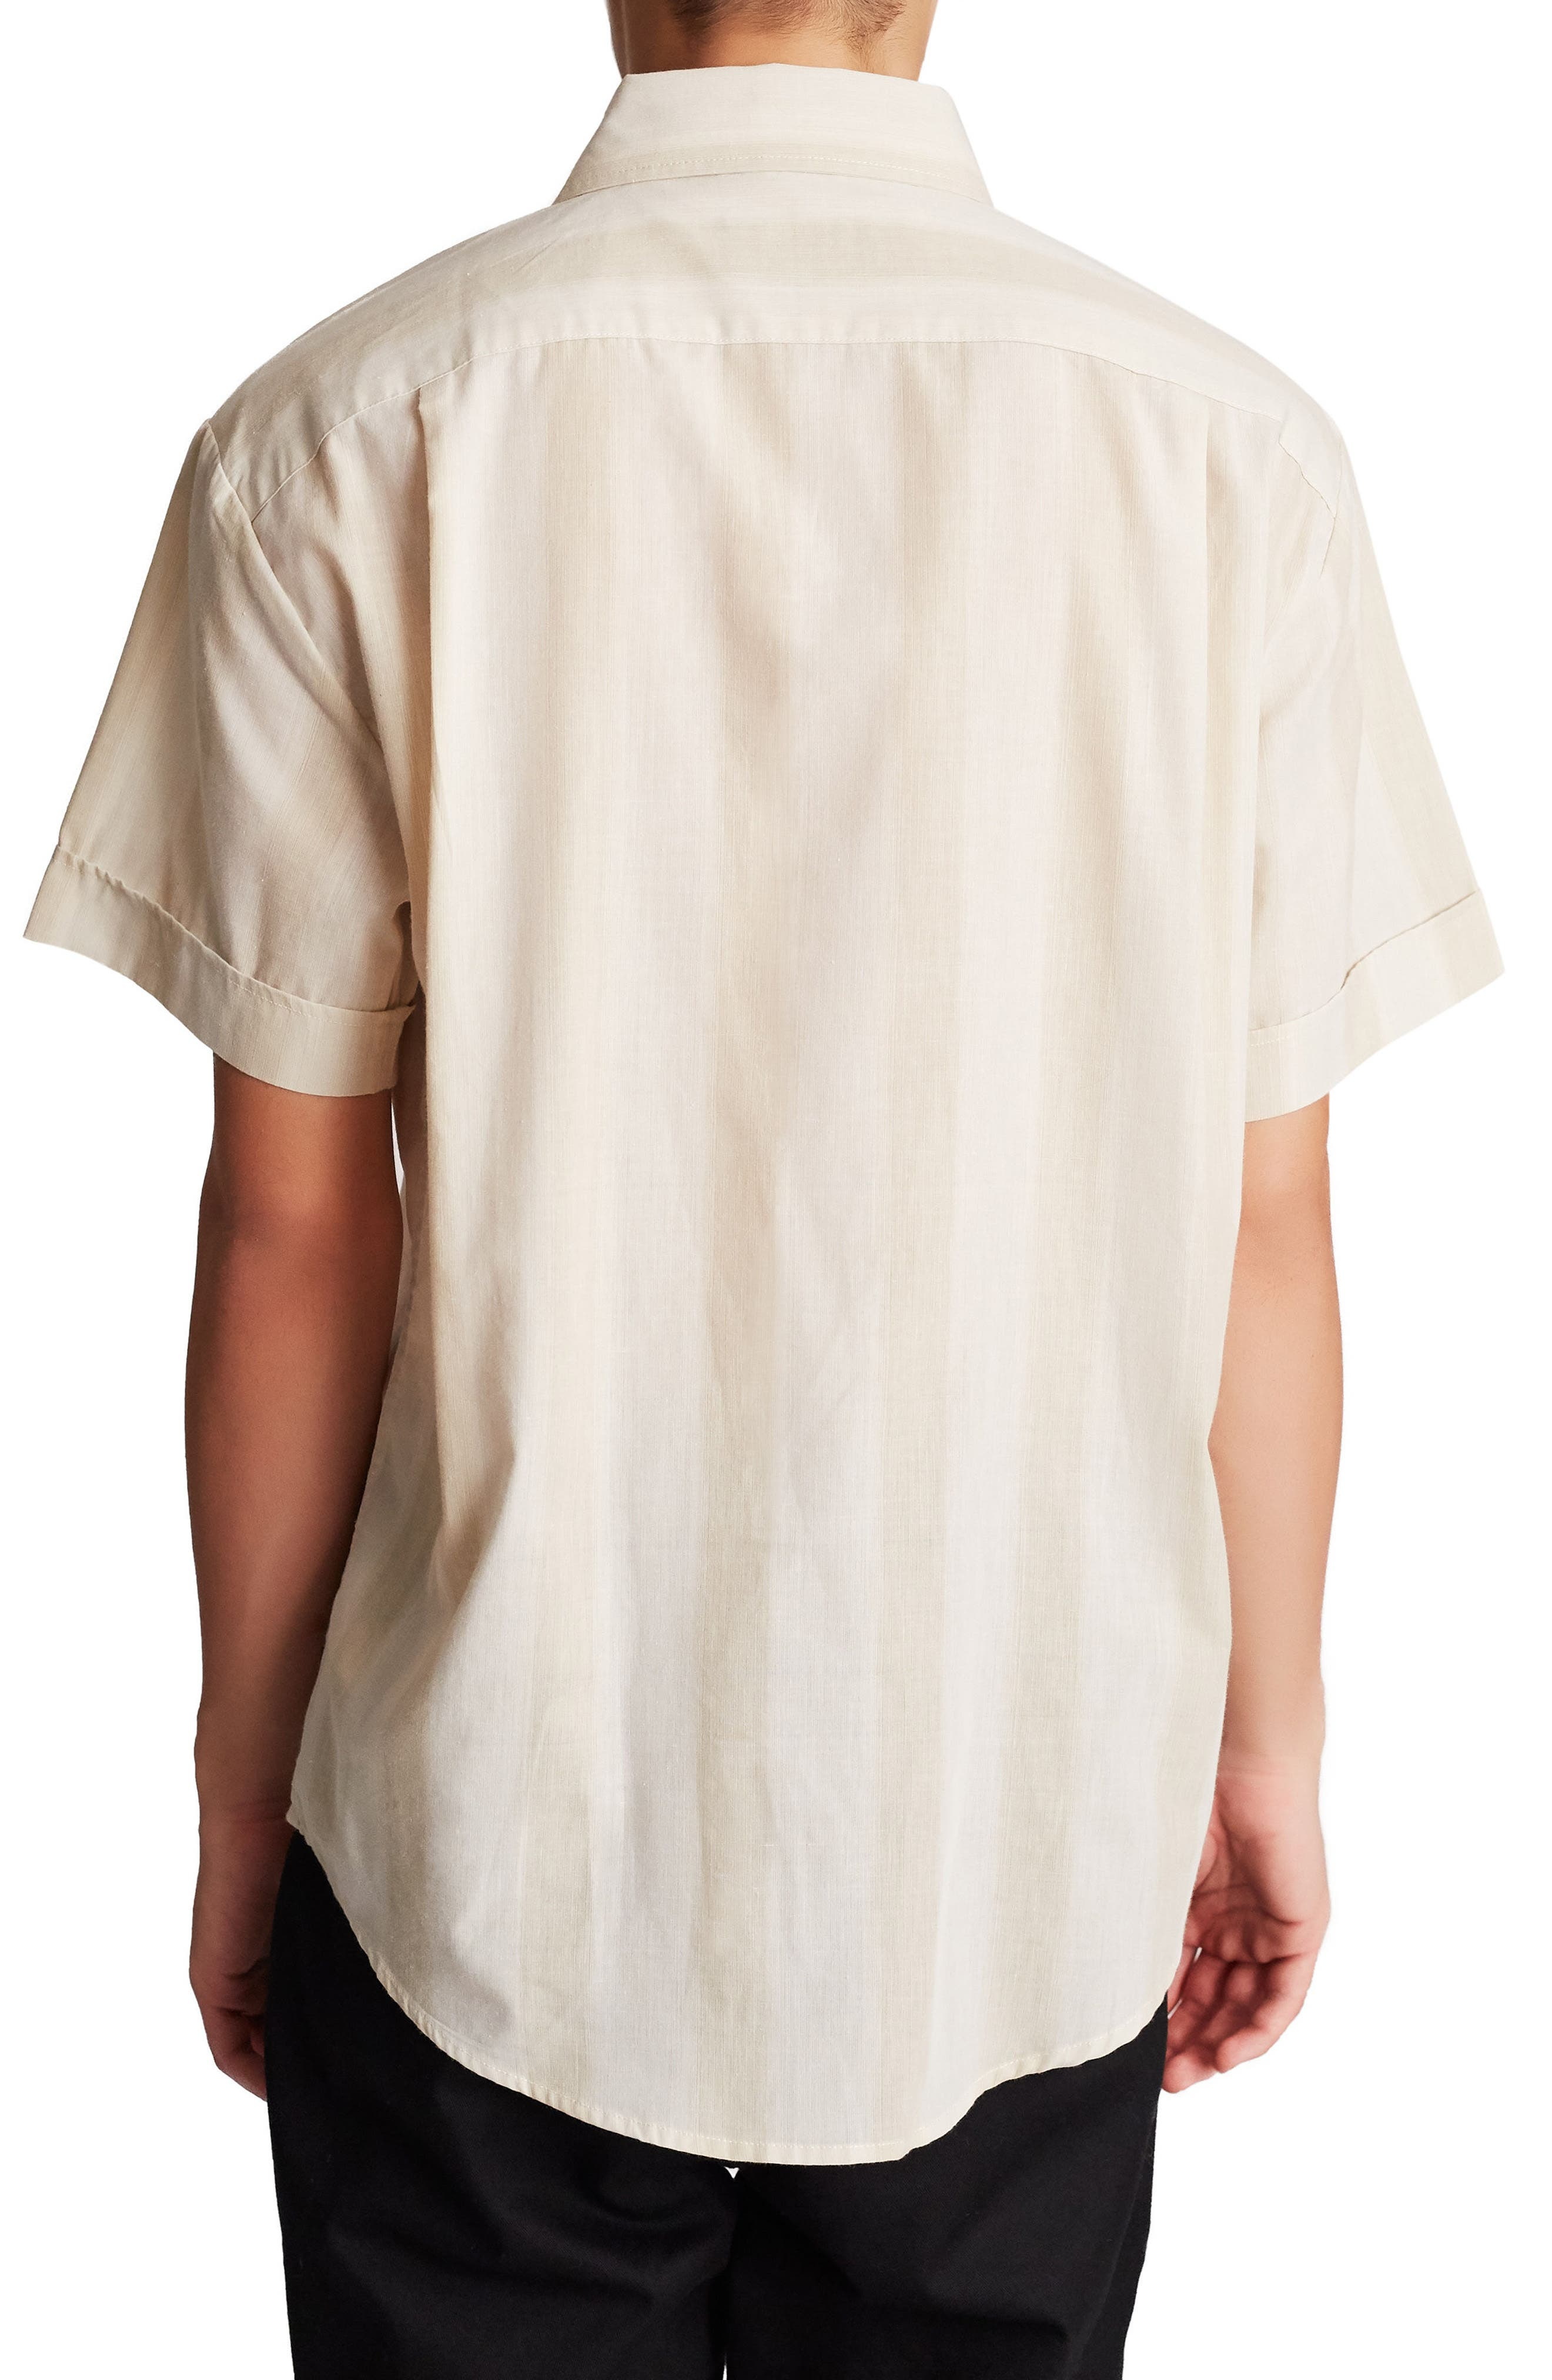 Branson Woven Shirt,                             Alternate thumbnail 2, color,                             GREY/ MINT